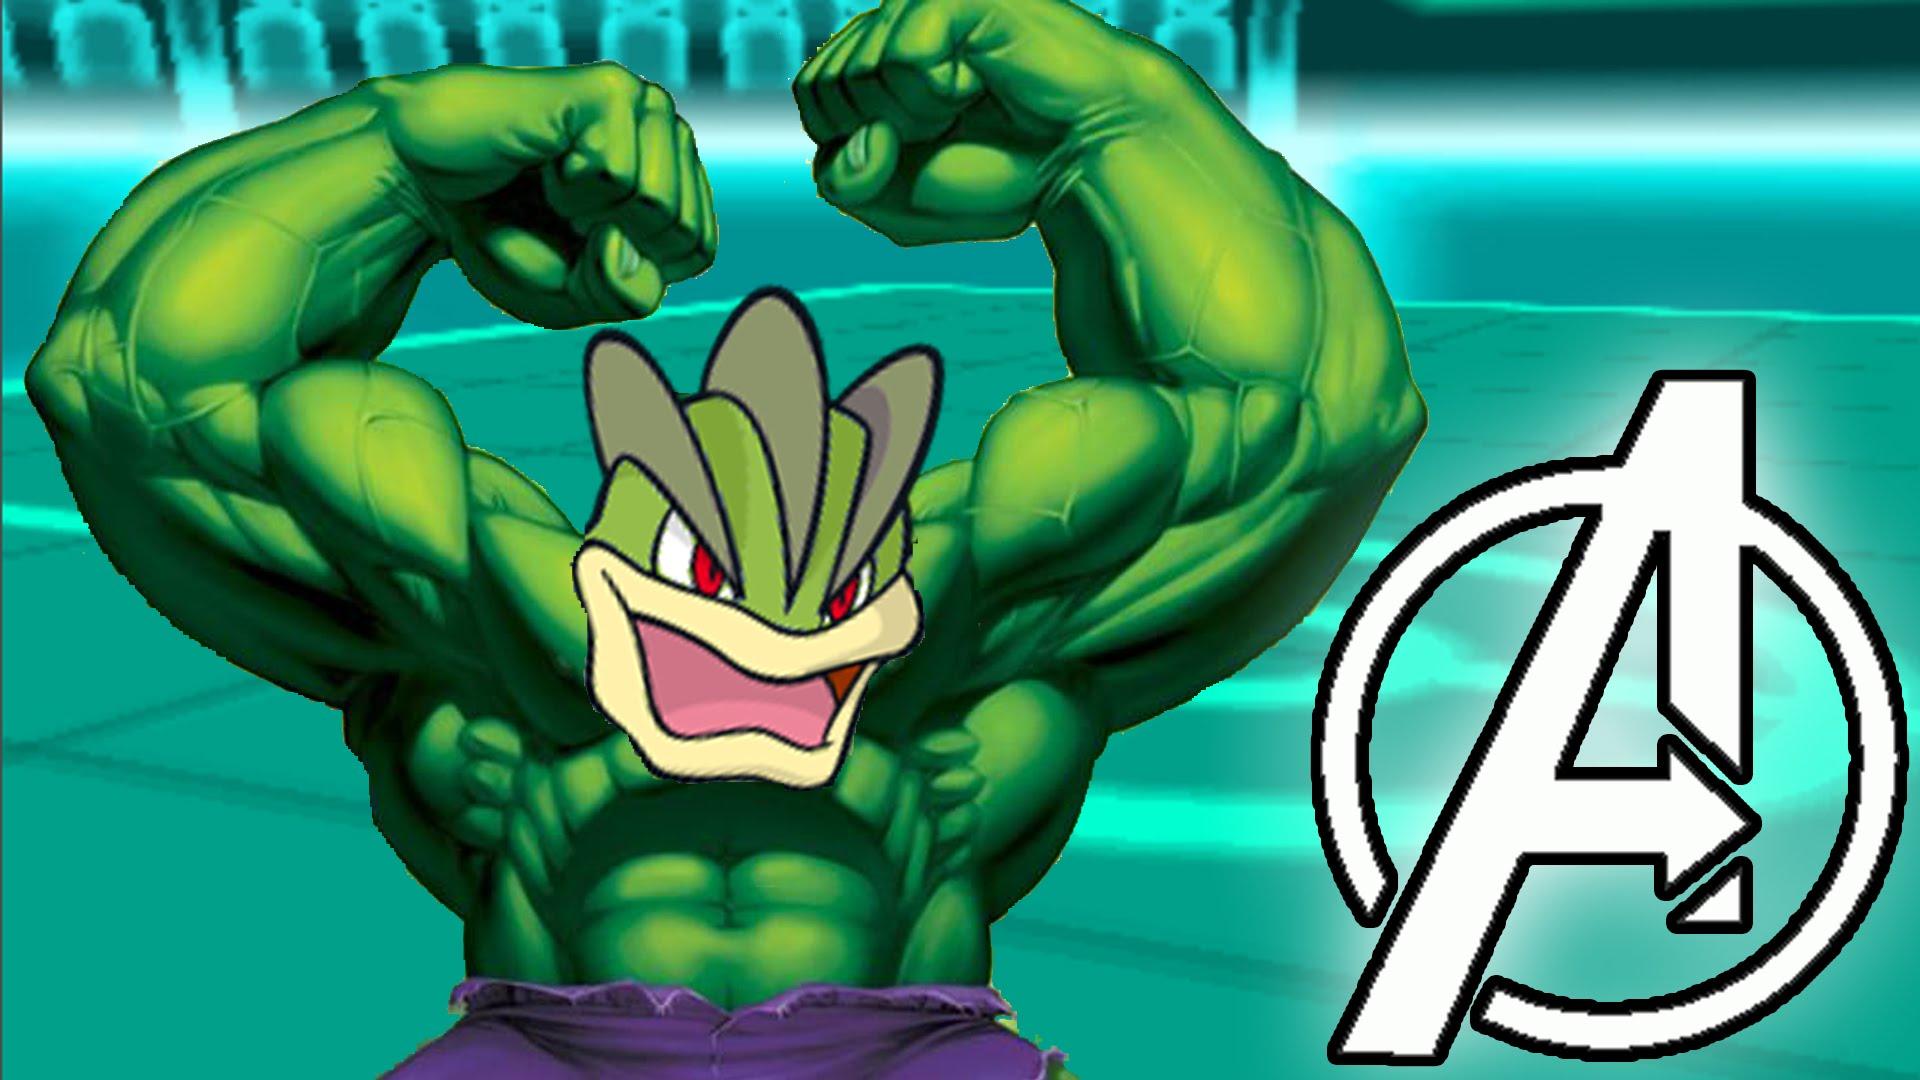 Pokemon Avengers Backgrounds, Compatible - PC, Mobile, Gadgets| 1920x1080 px